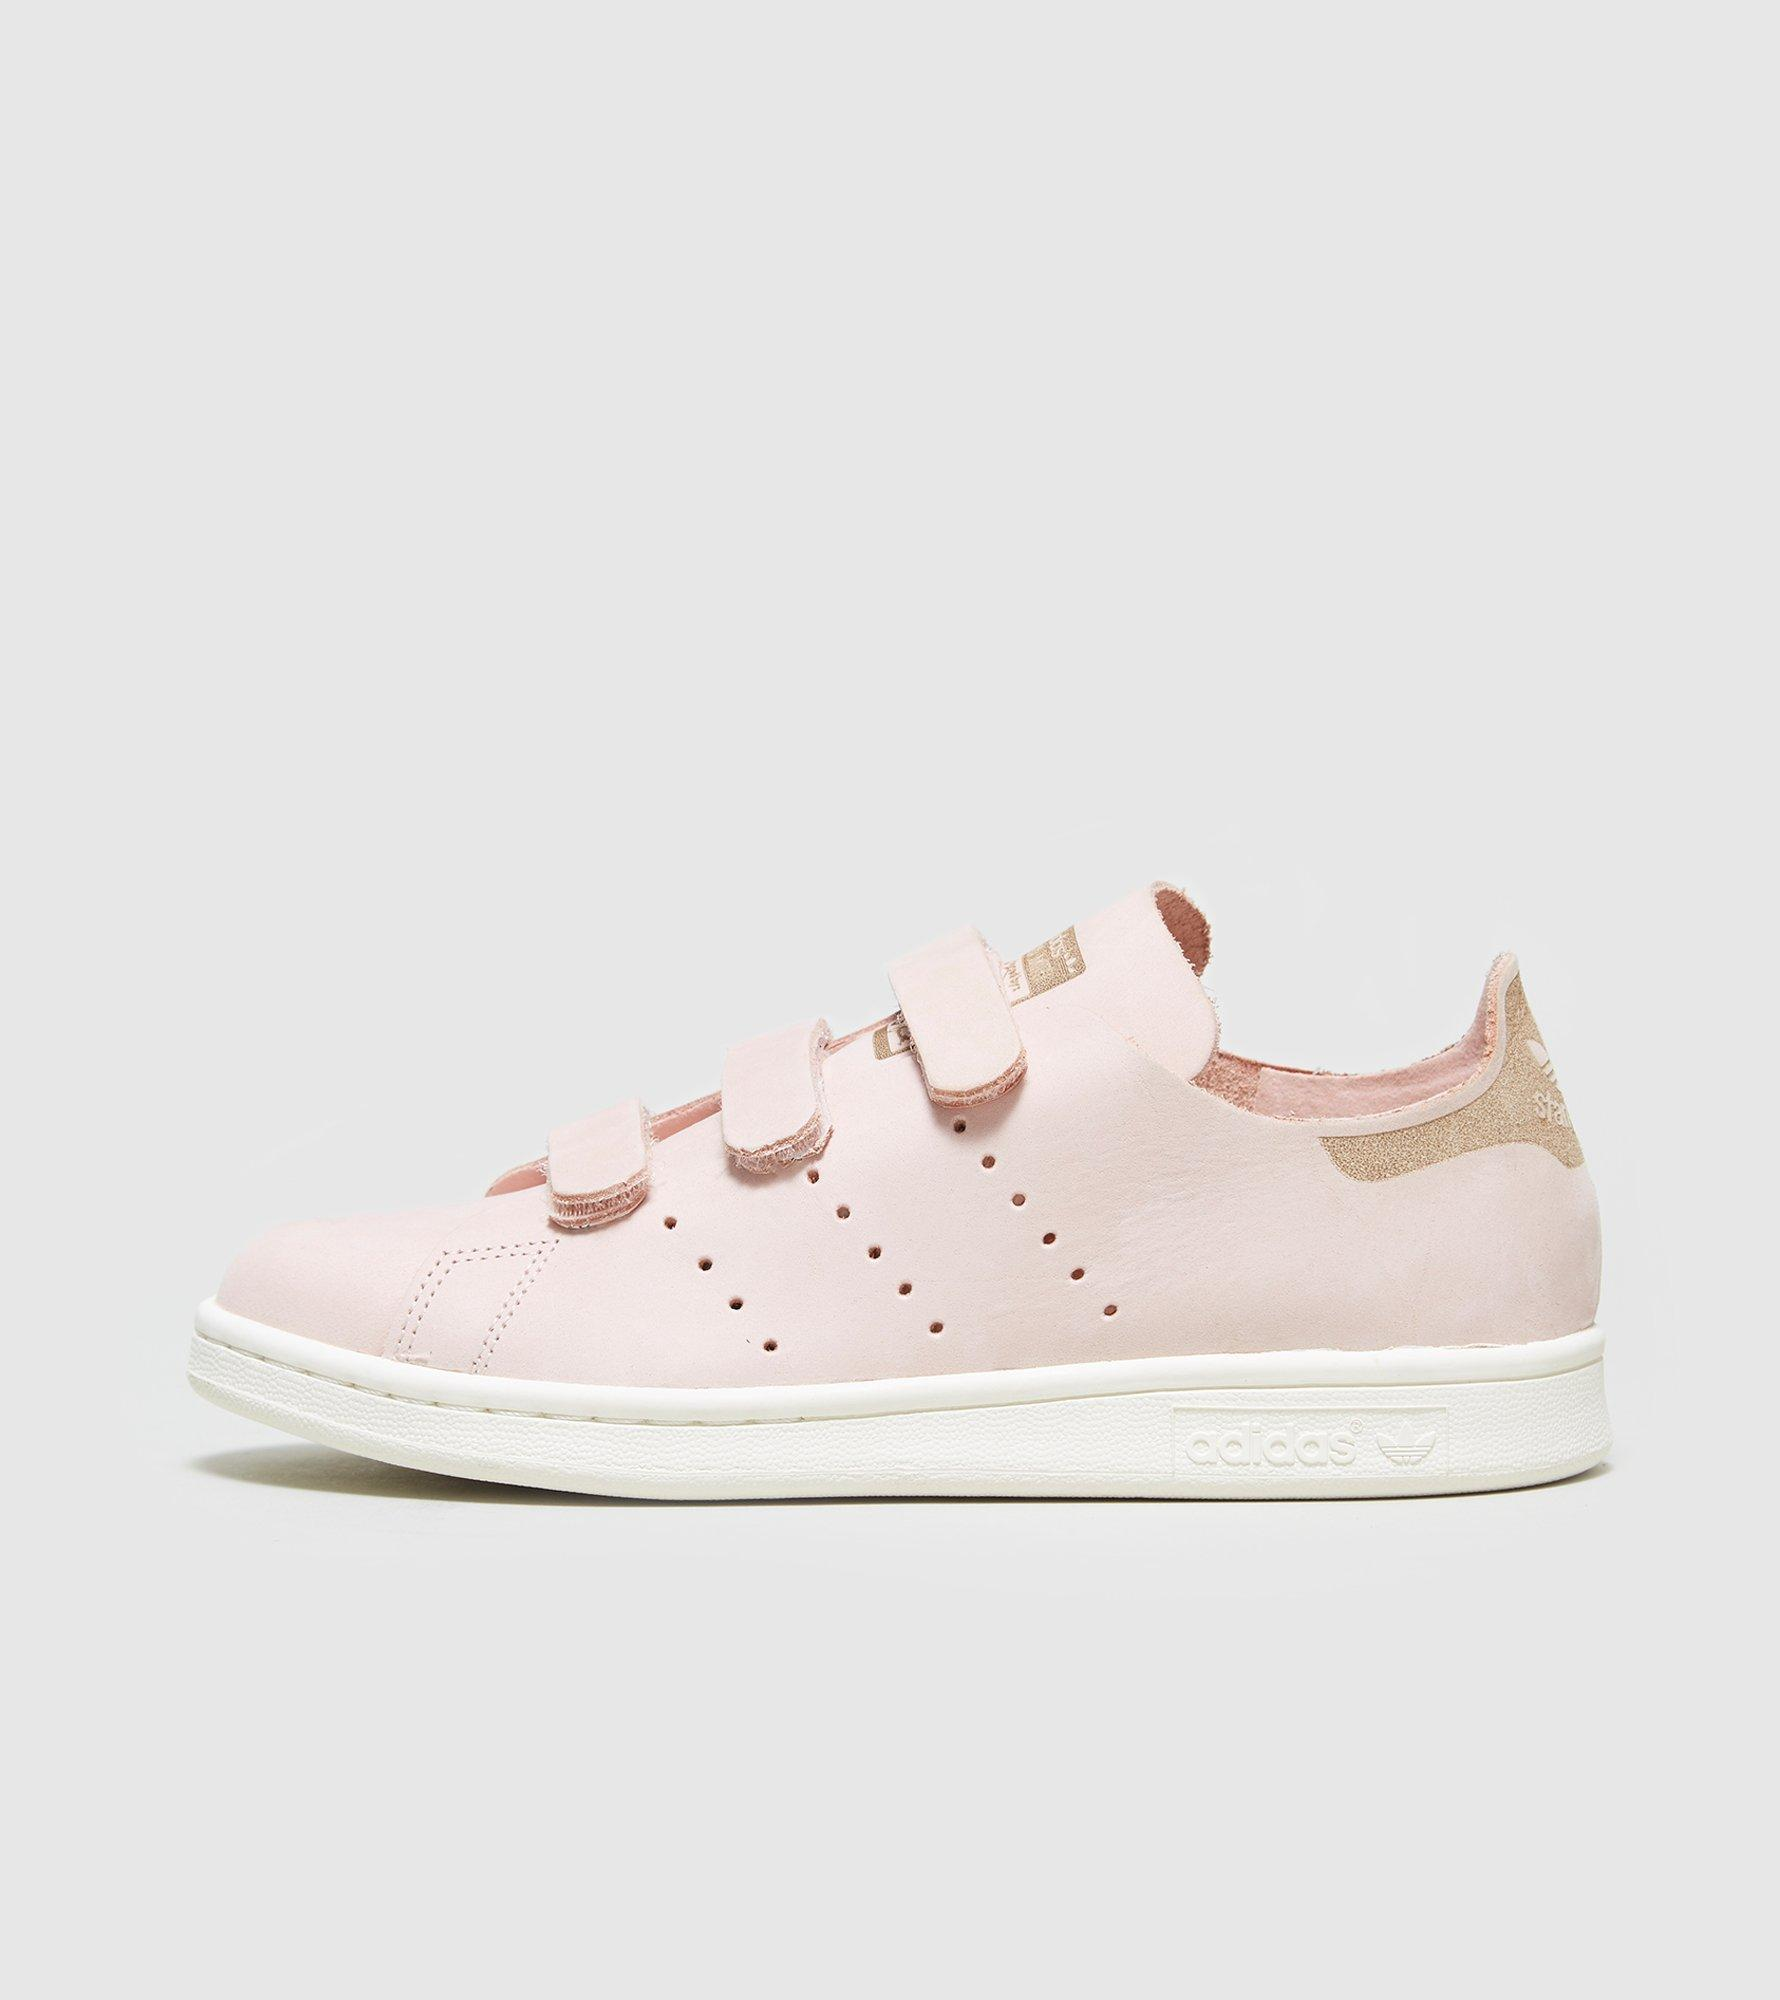 Mauro Leone Shoes Uk